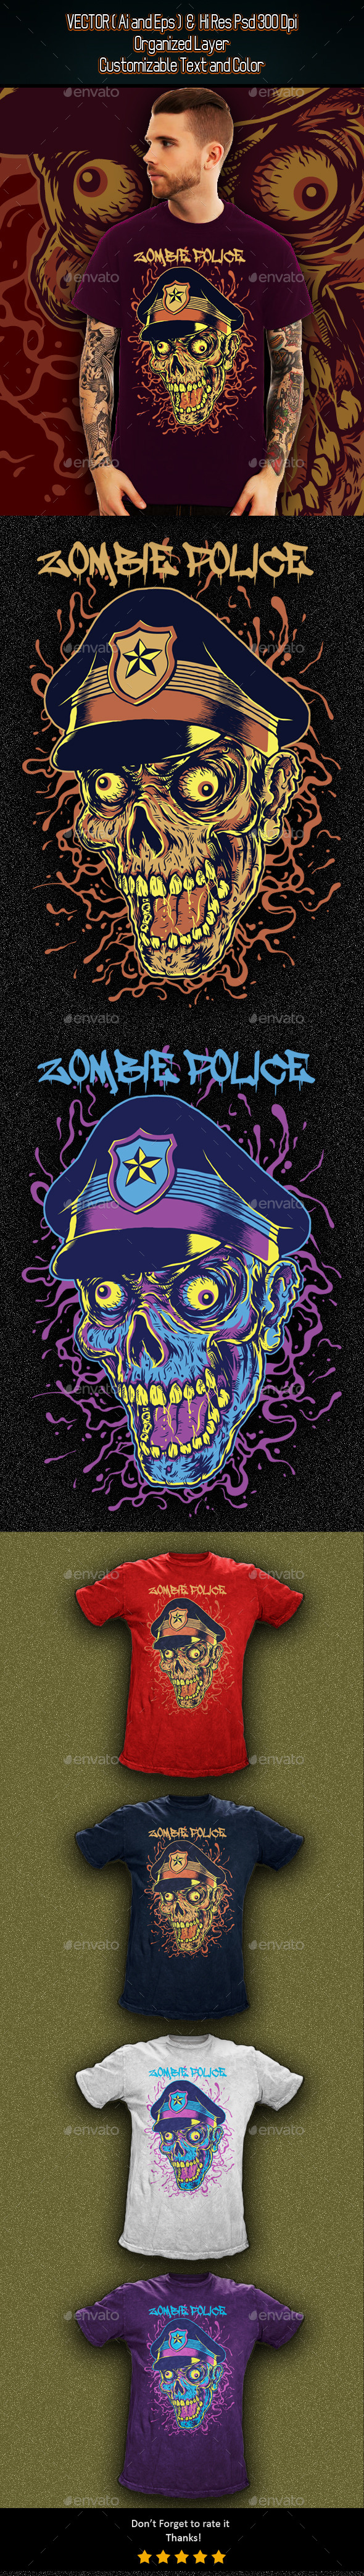 Zombie Head Police - Grunge Designs